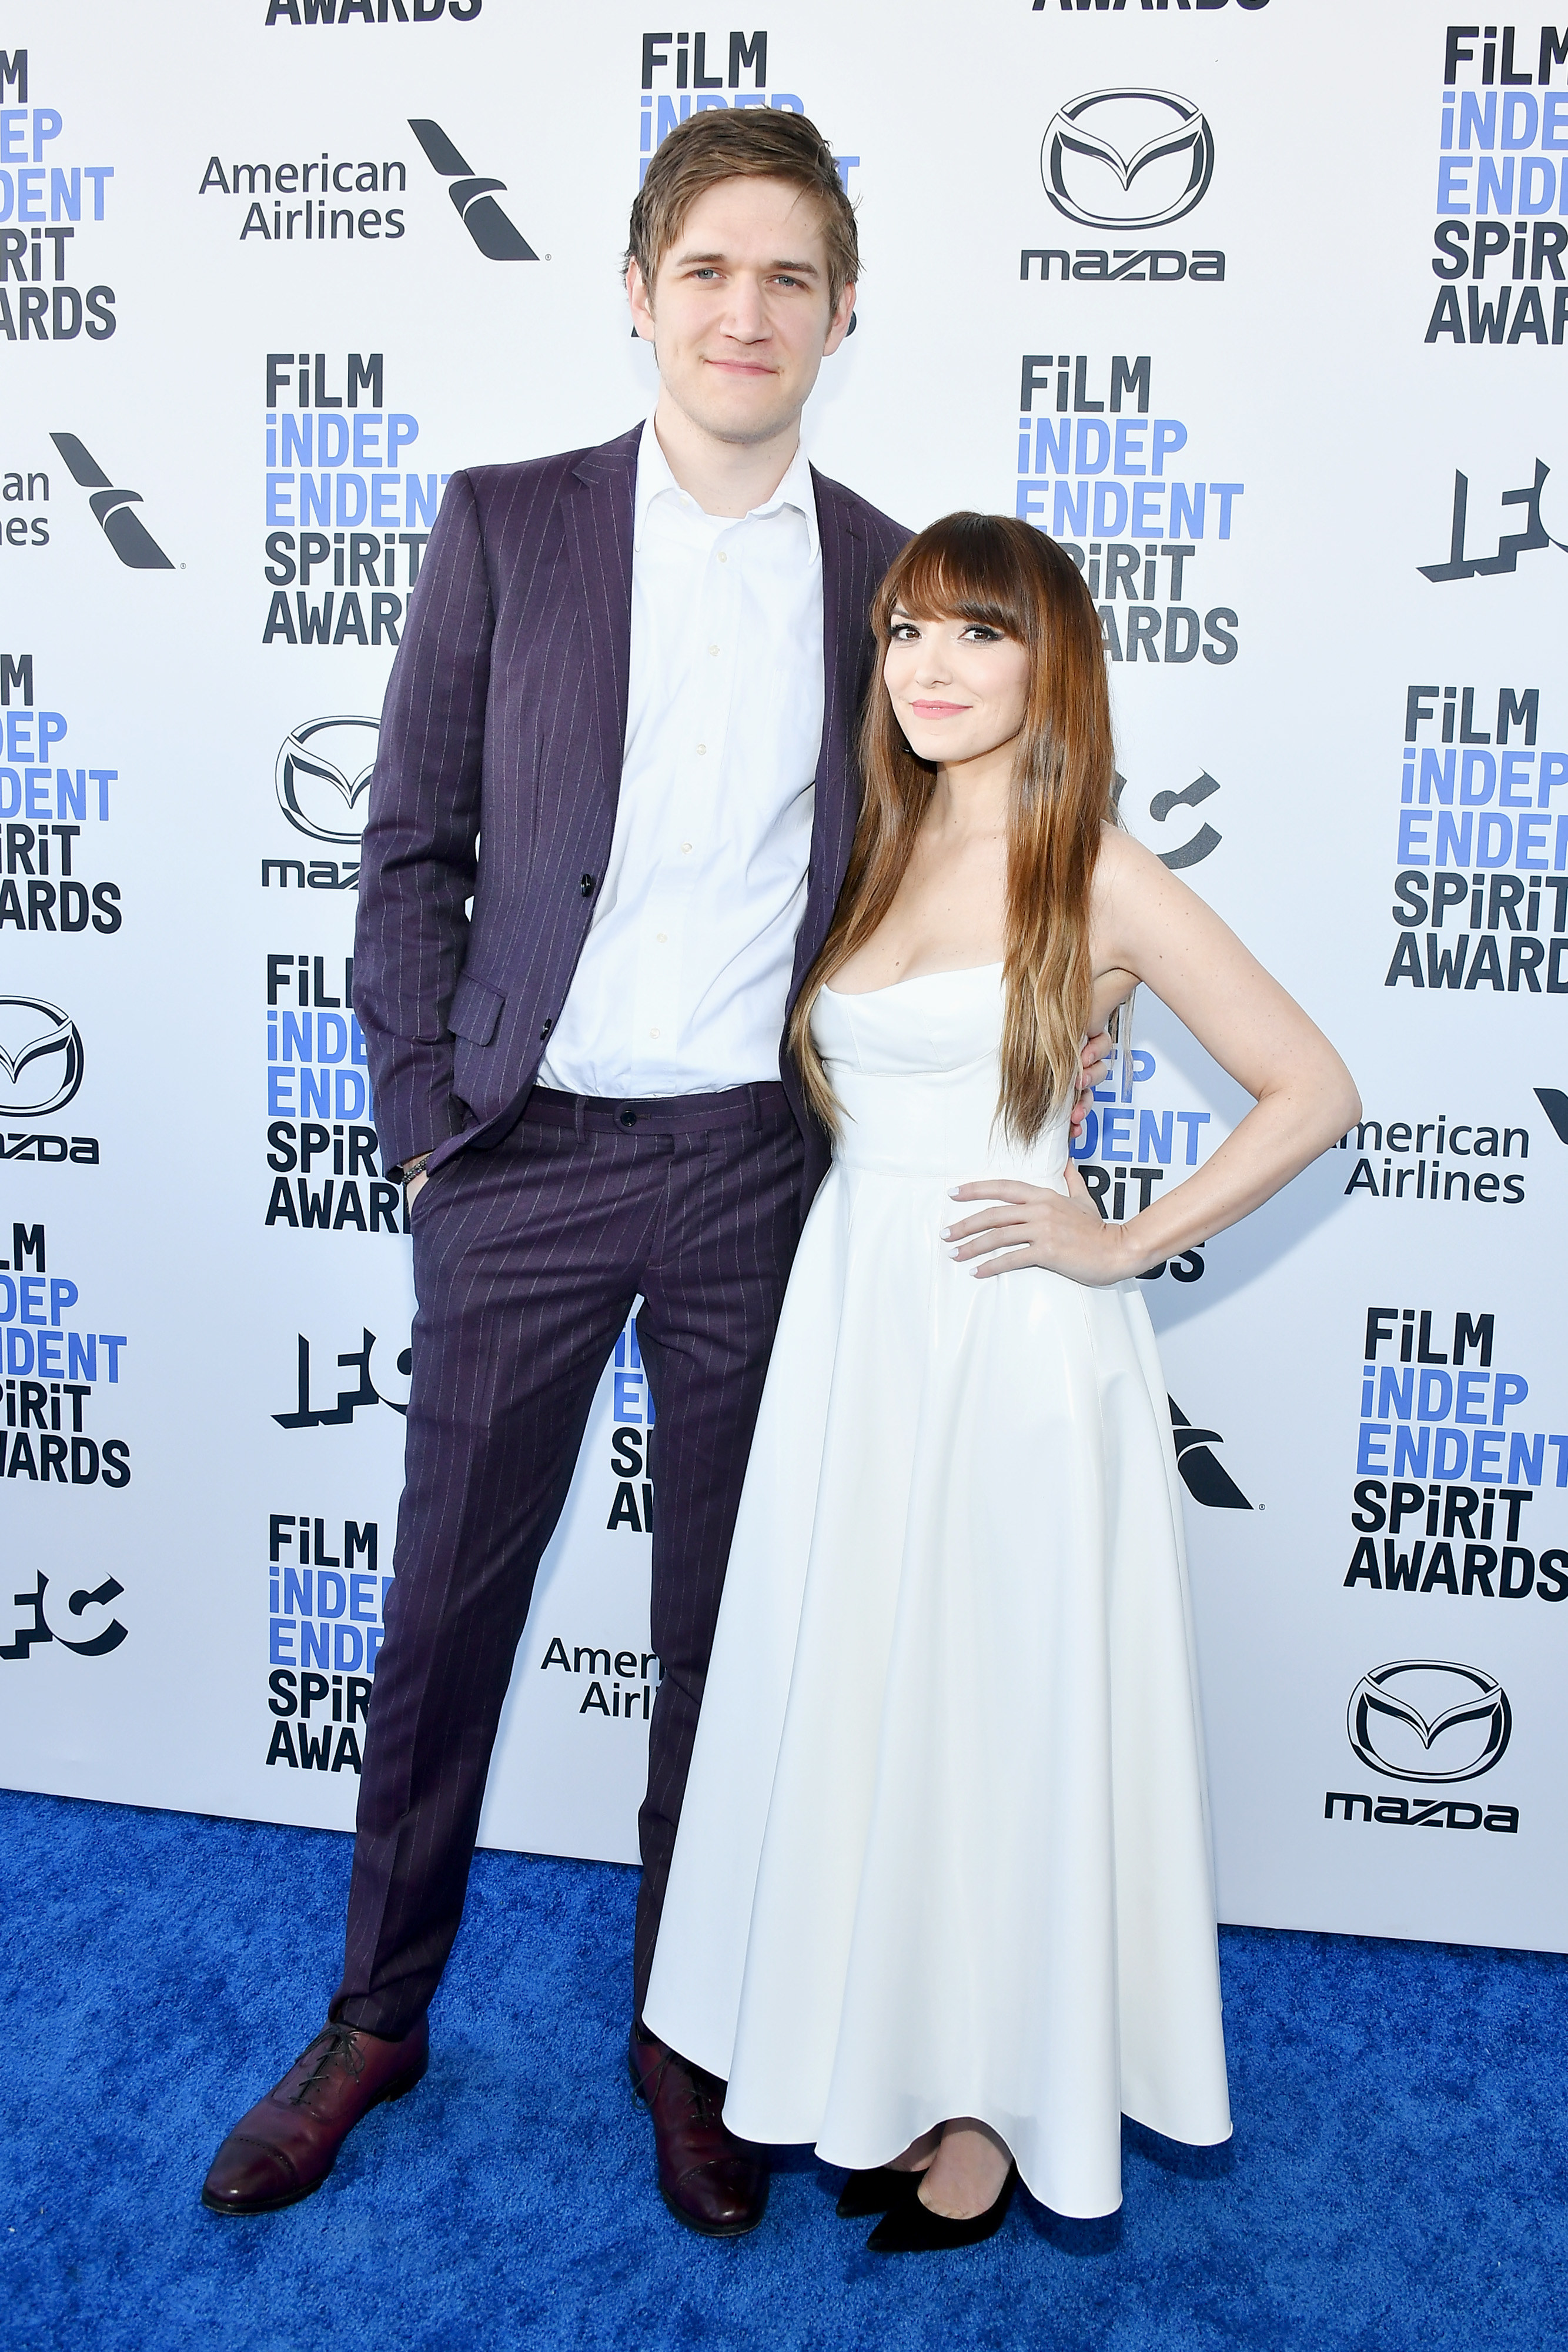 Bo andLorene on the Independent Spirit Awards red carpet